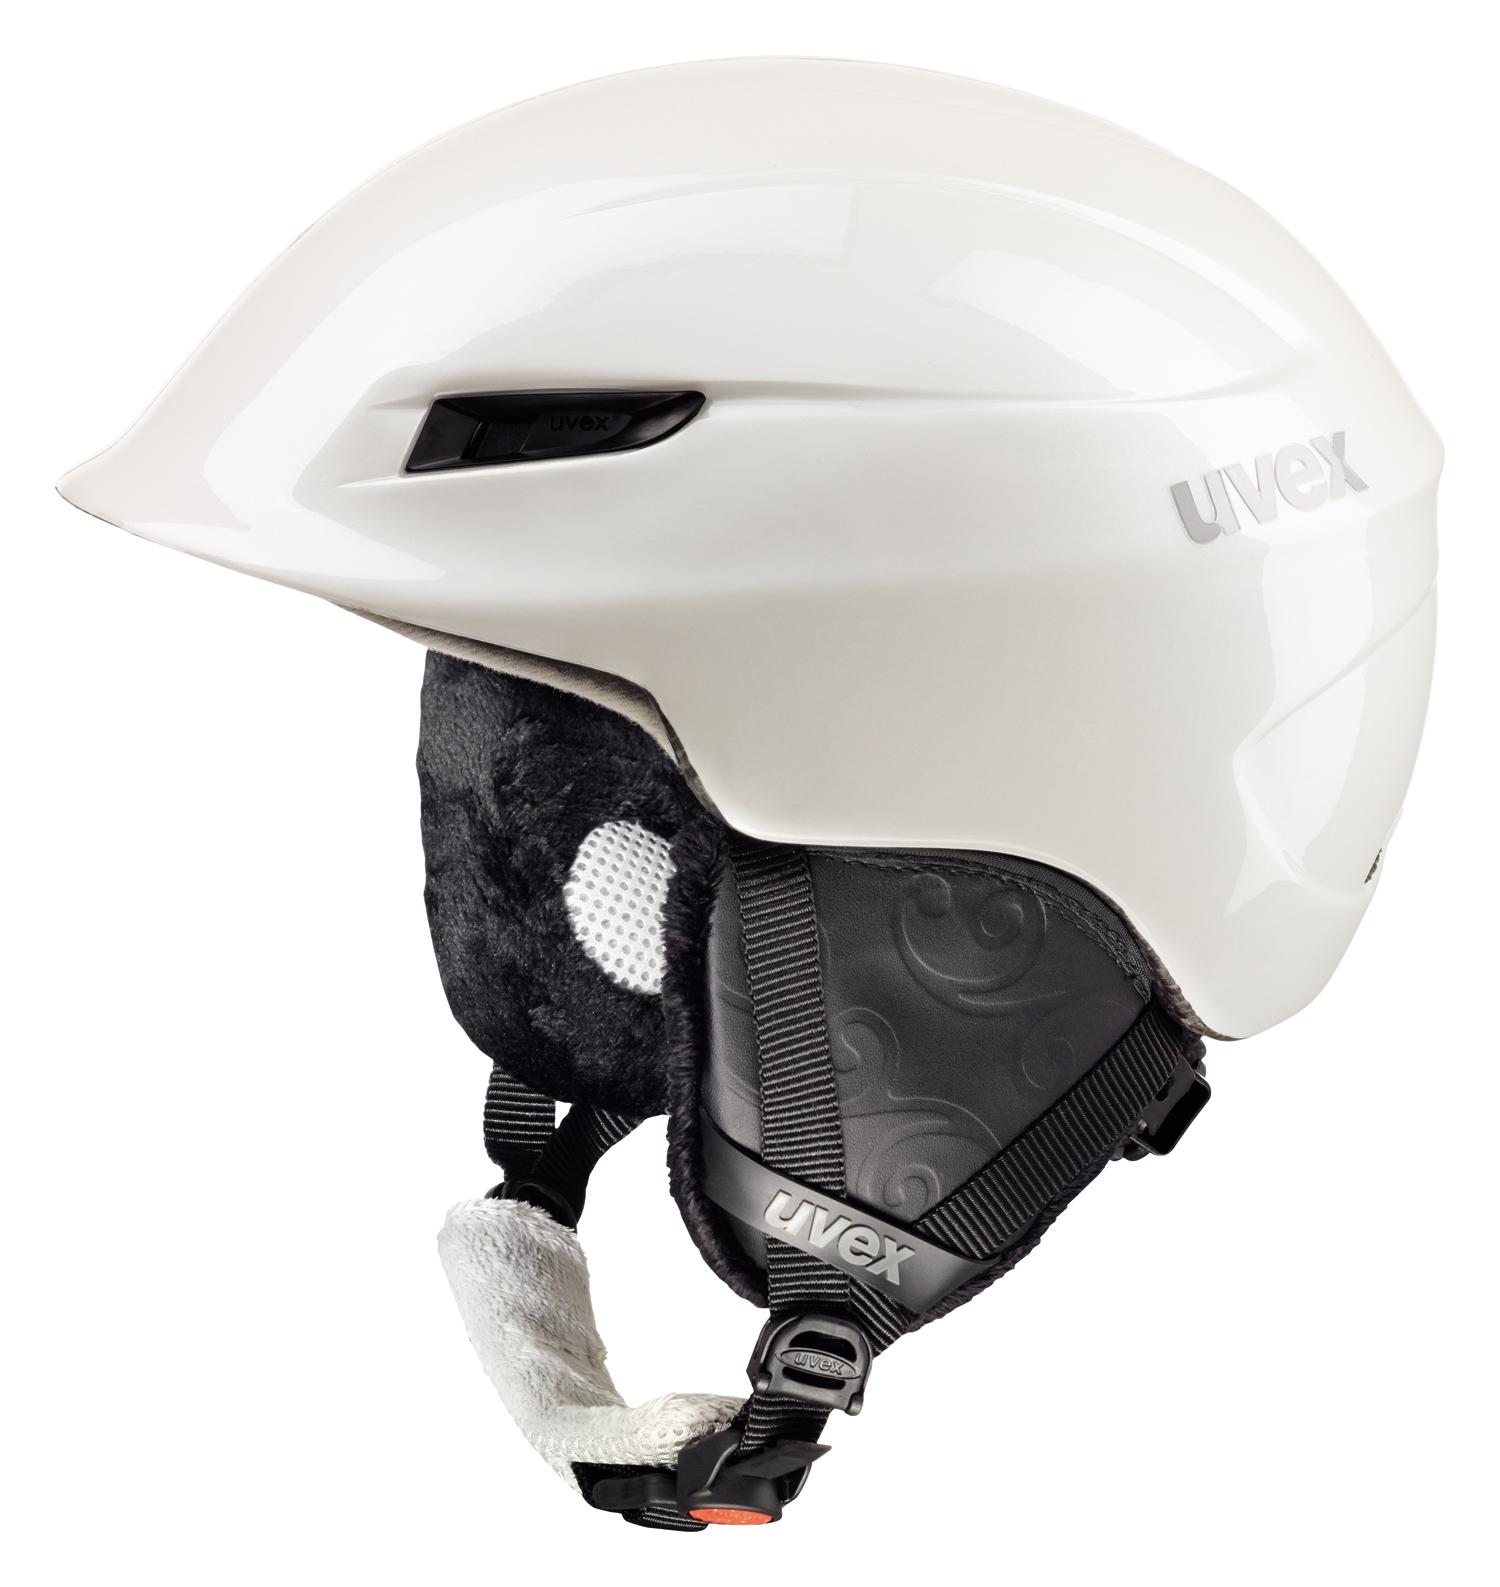 UVEX GAMMA WL, white-pearlescent S566190120 53-58 cm